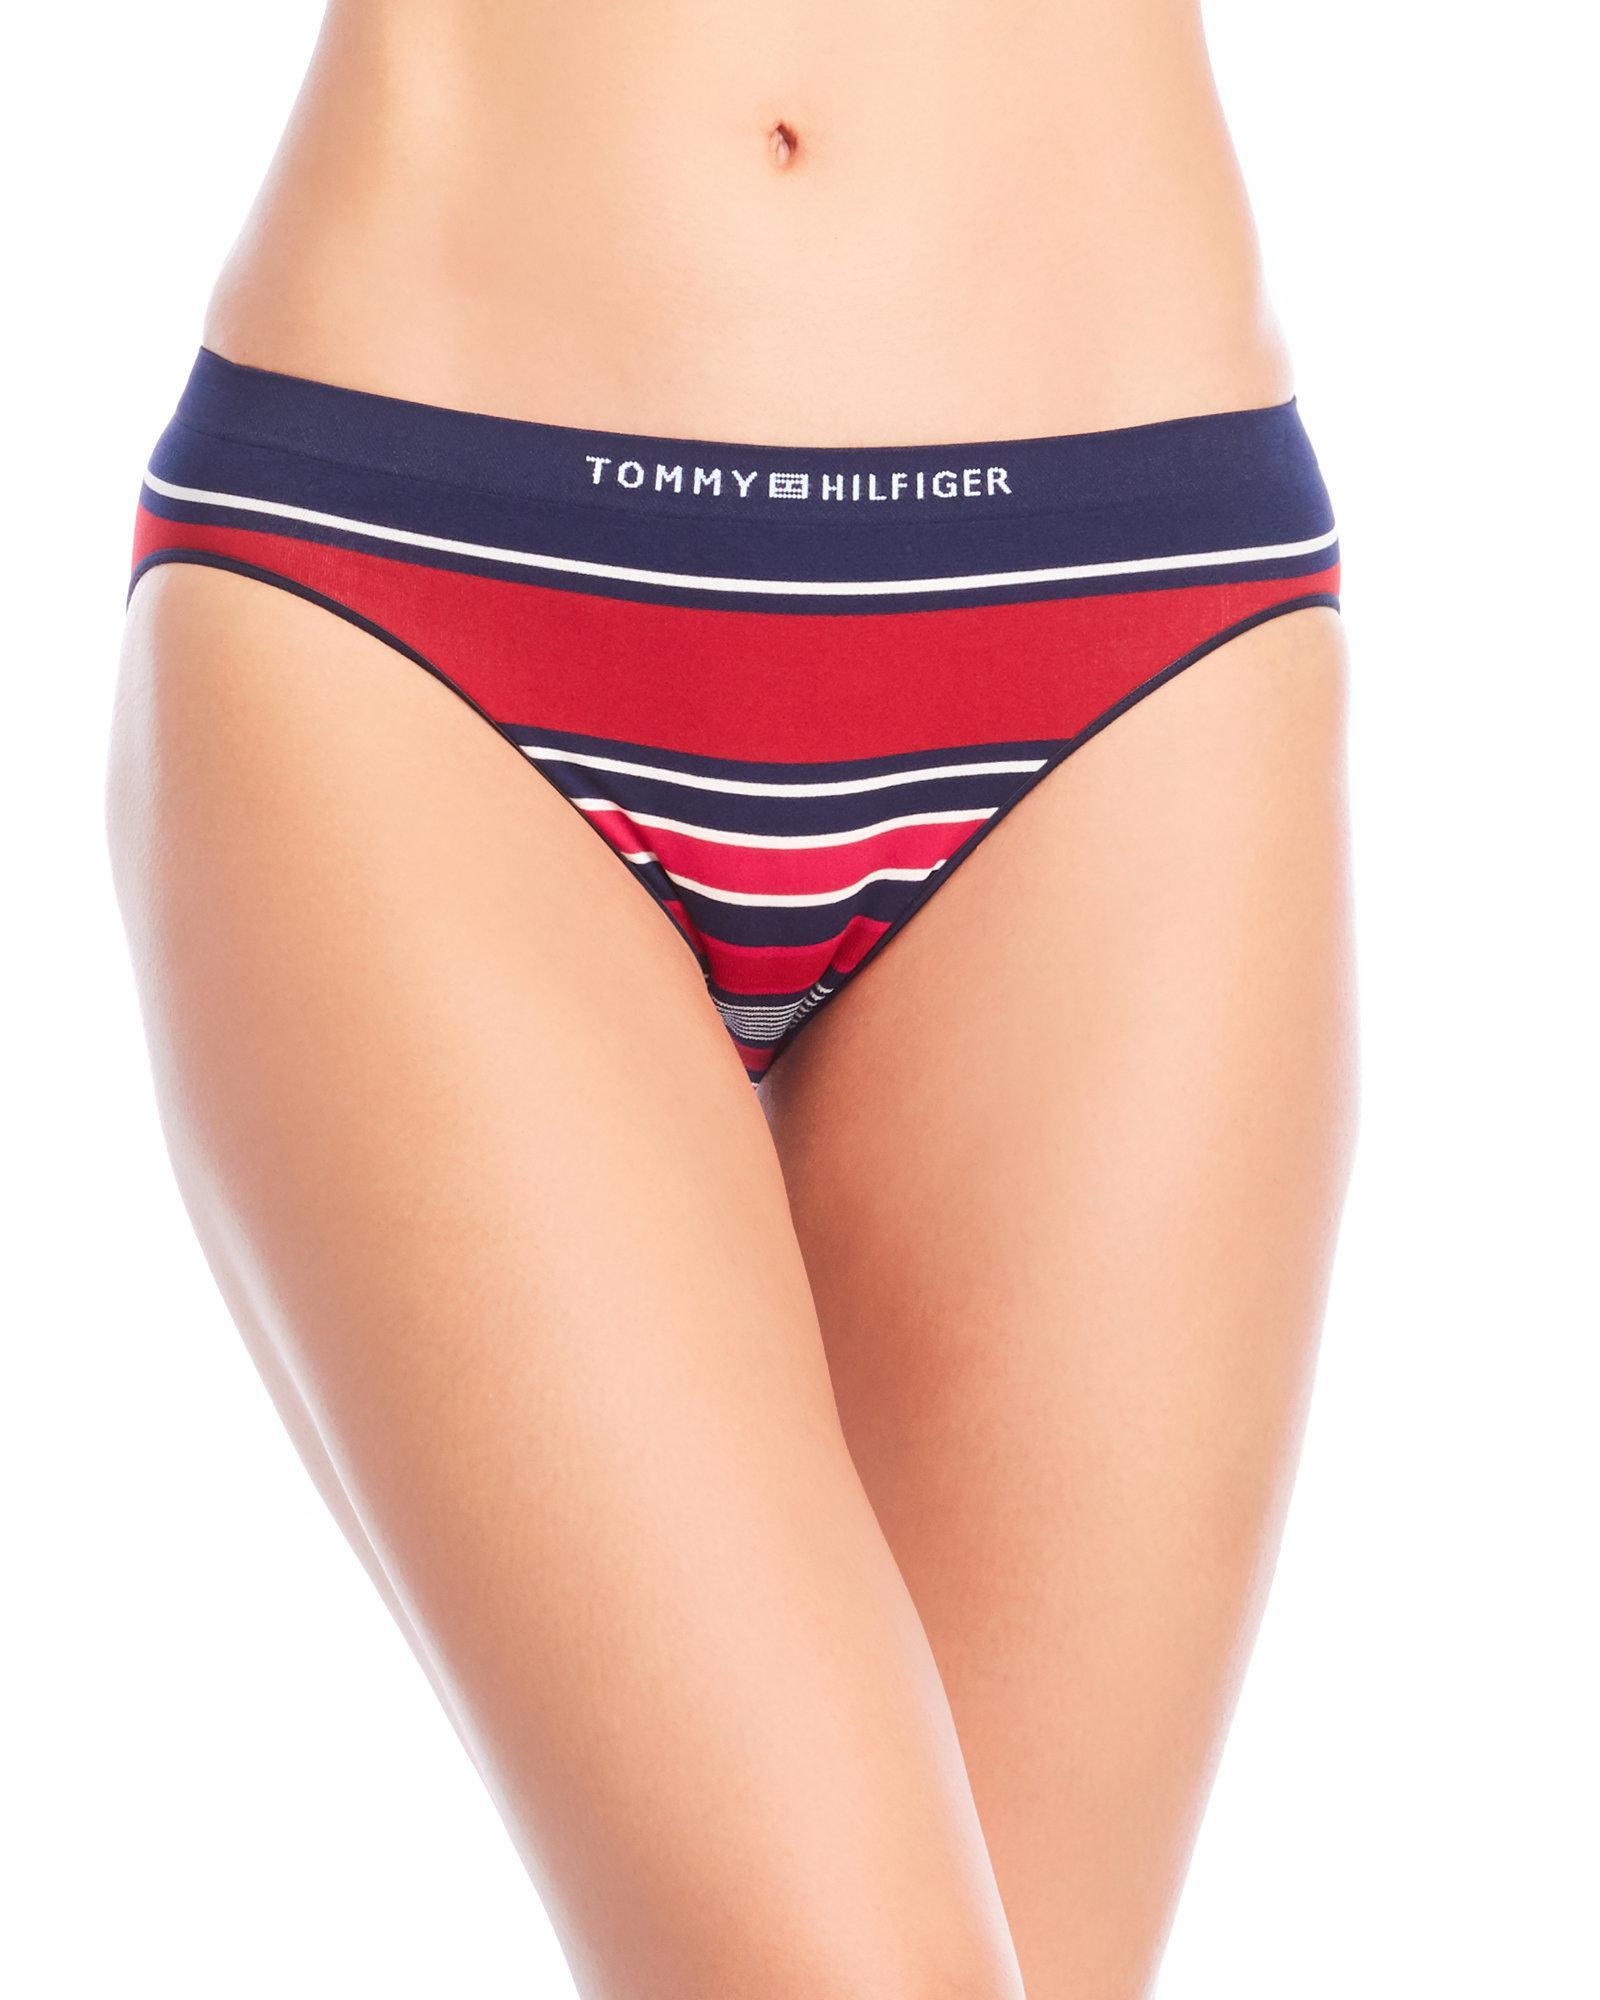 6d9bd1b4a4 Lyst - Tommy Hilfiger Two-Pack Seamless Bikini Panty in Blue